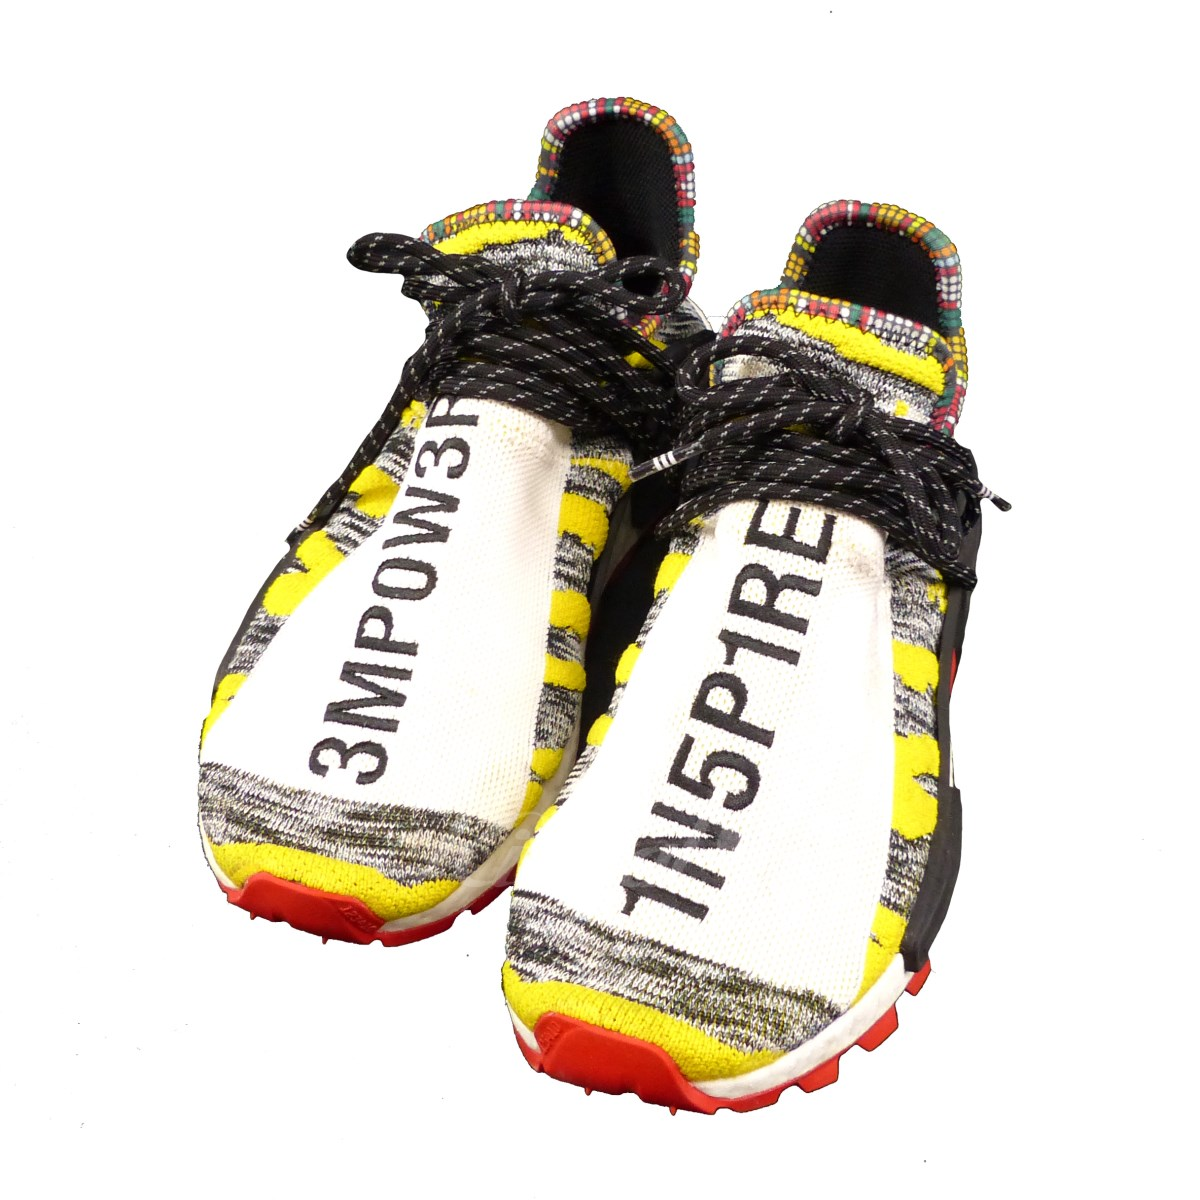 adidas oribinals X Pharrell Williams SOLAR HU NMD multicolored size: 26. 0 (Adidas original X Farrell Williams)